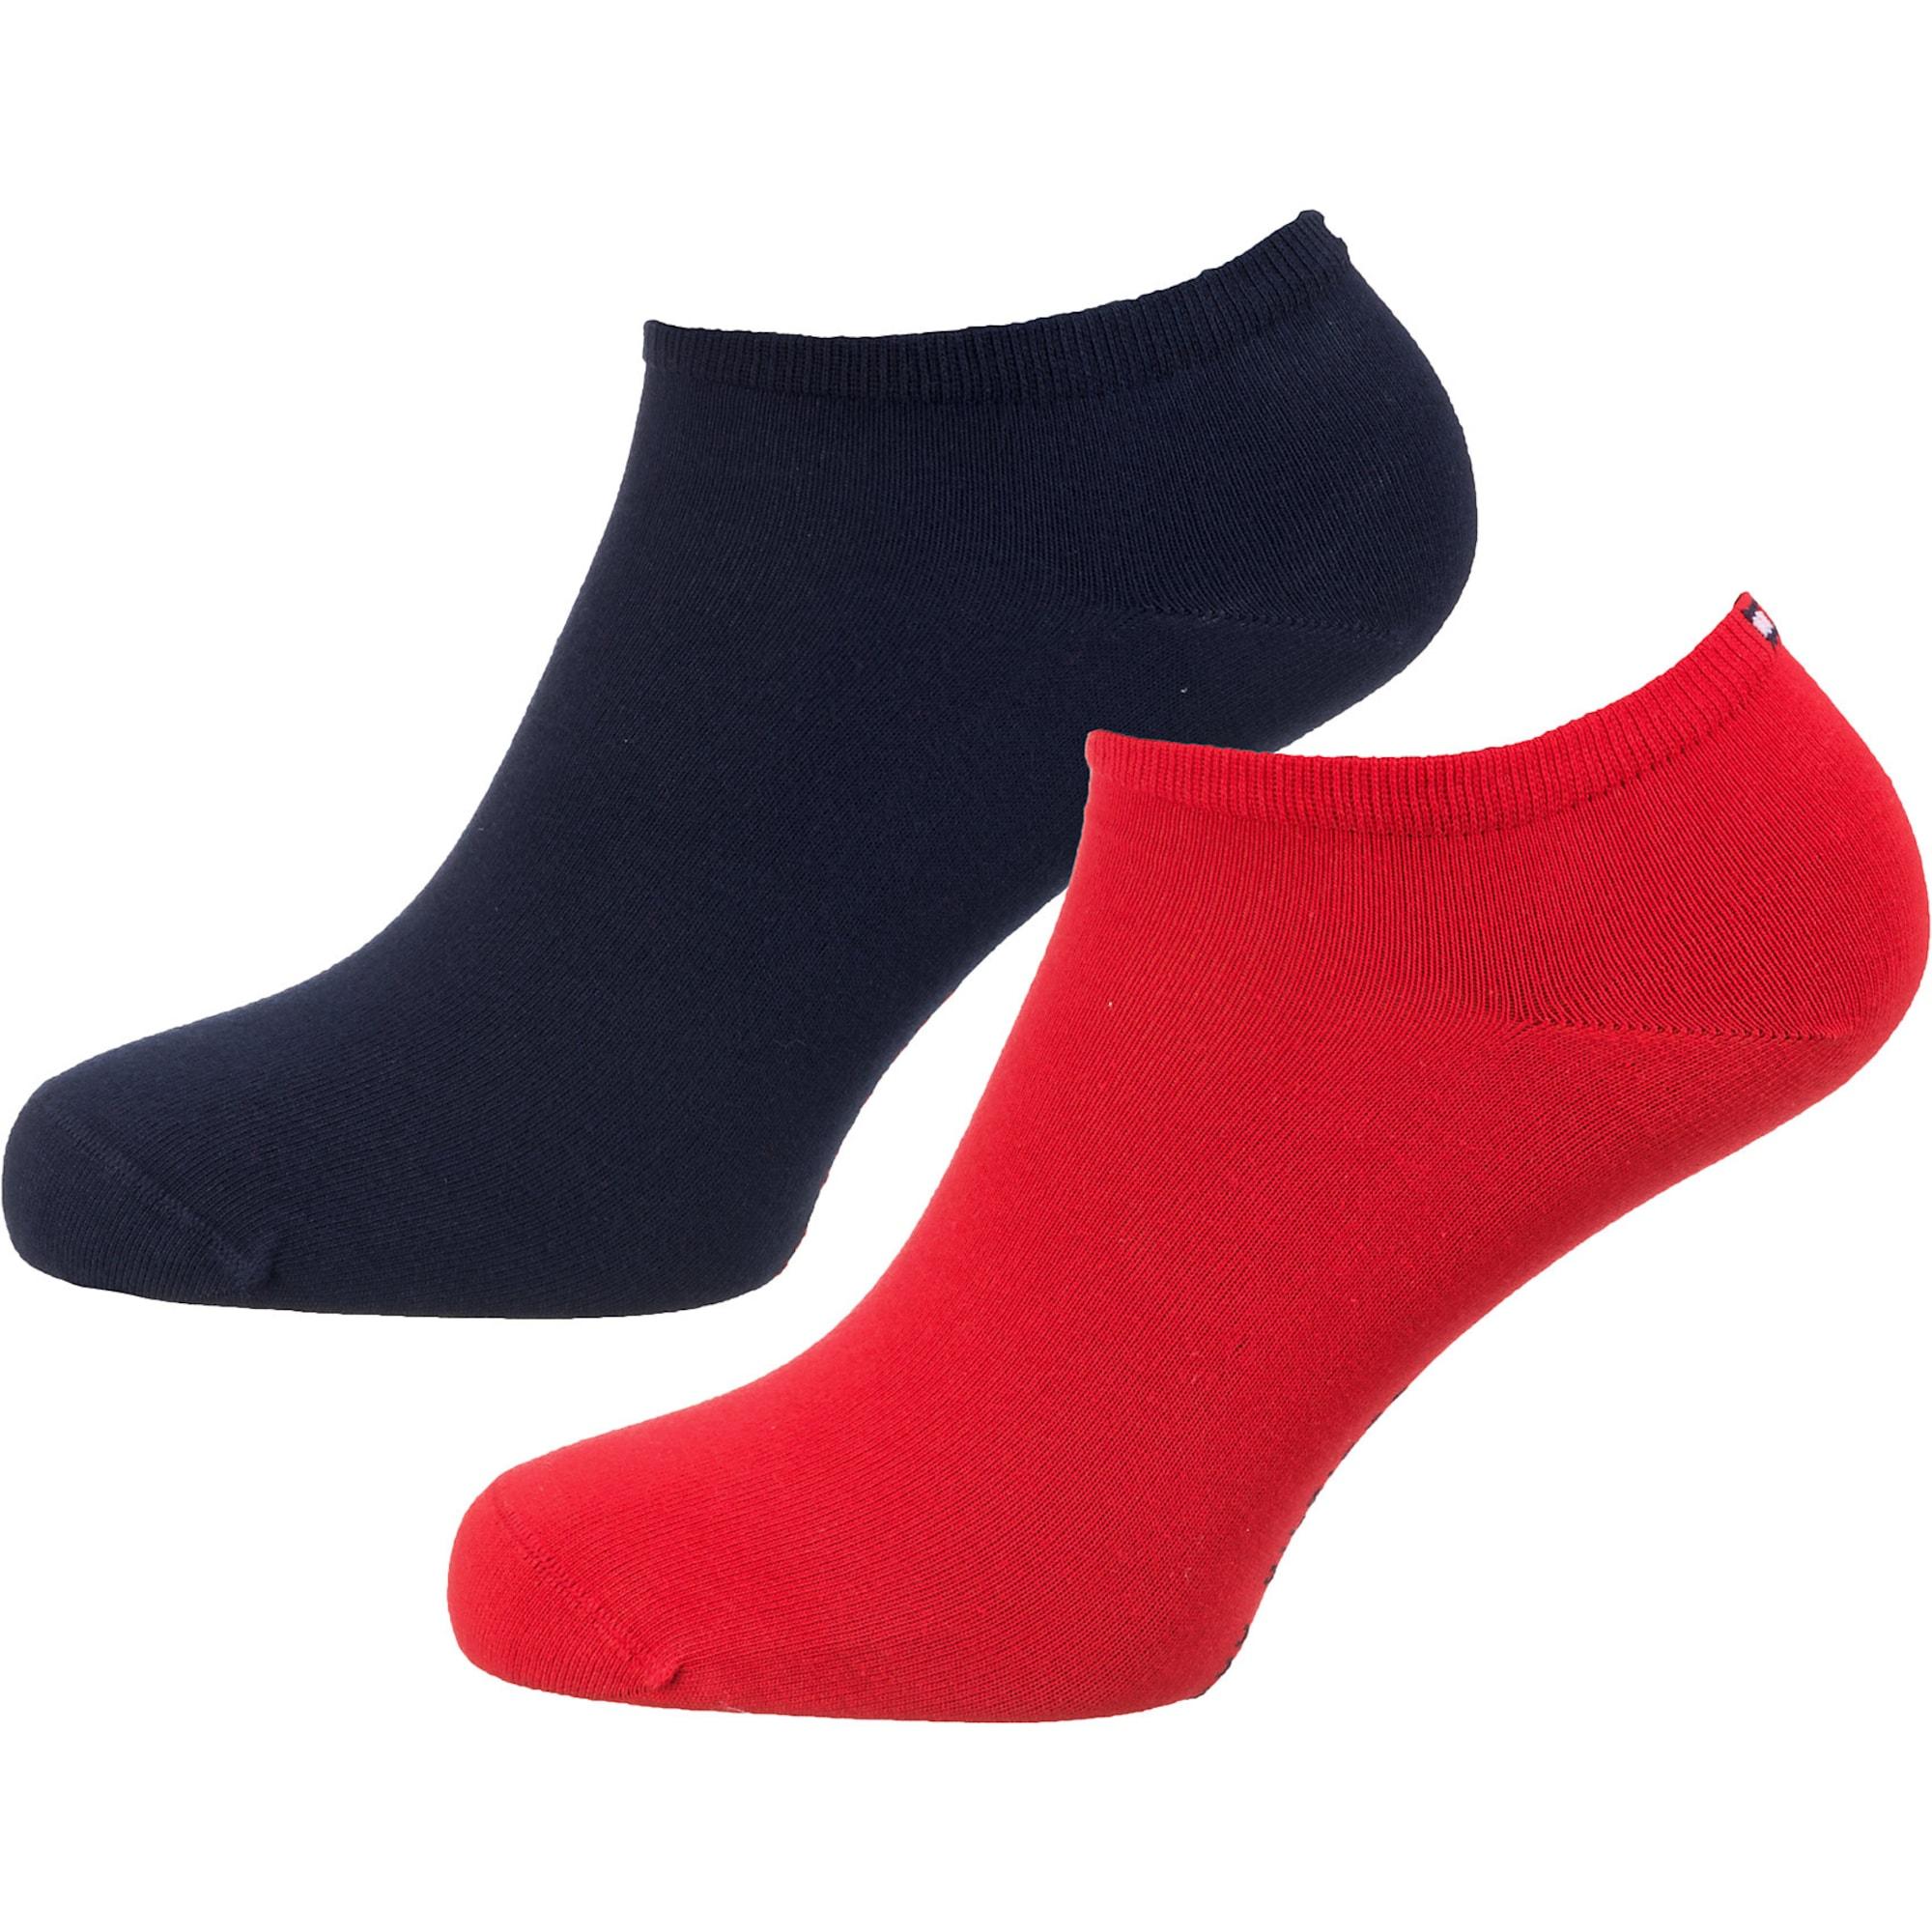 Sneakersocken | Sportbekleidung > Funktionswäsche > Sportsocken | Tommy Hilfiger